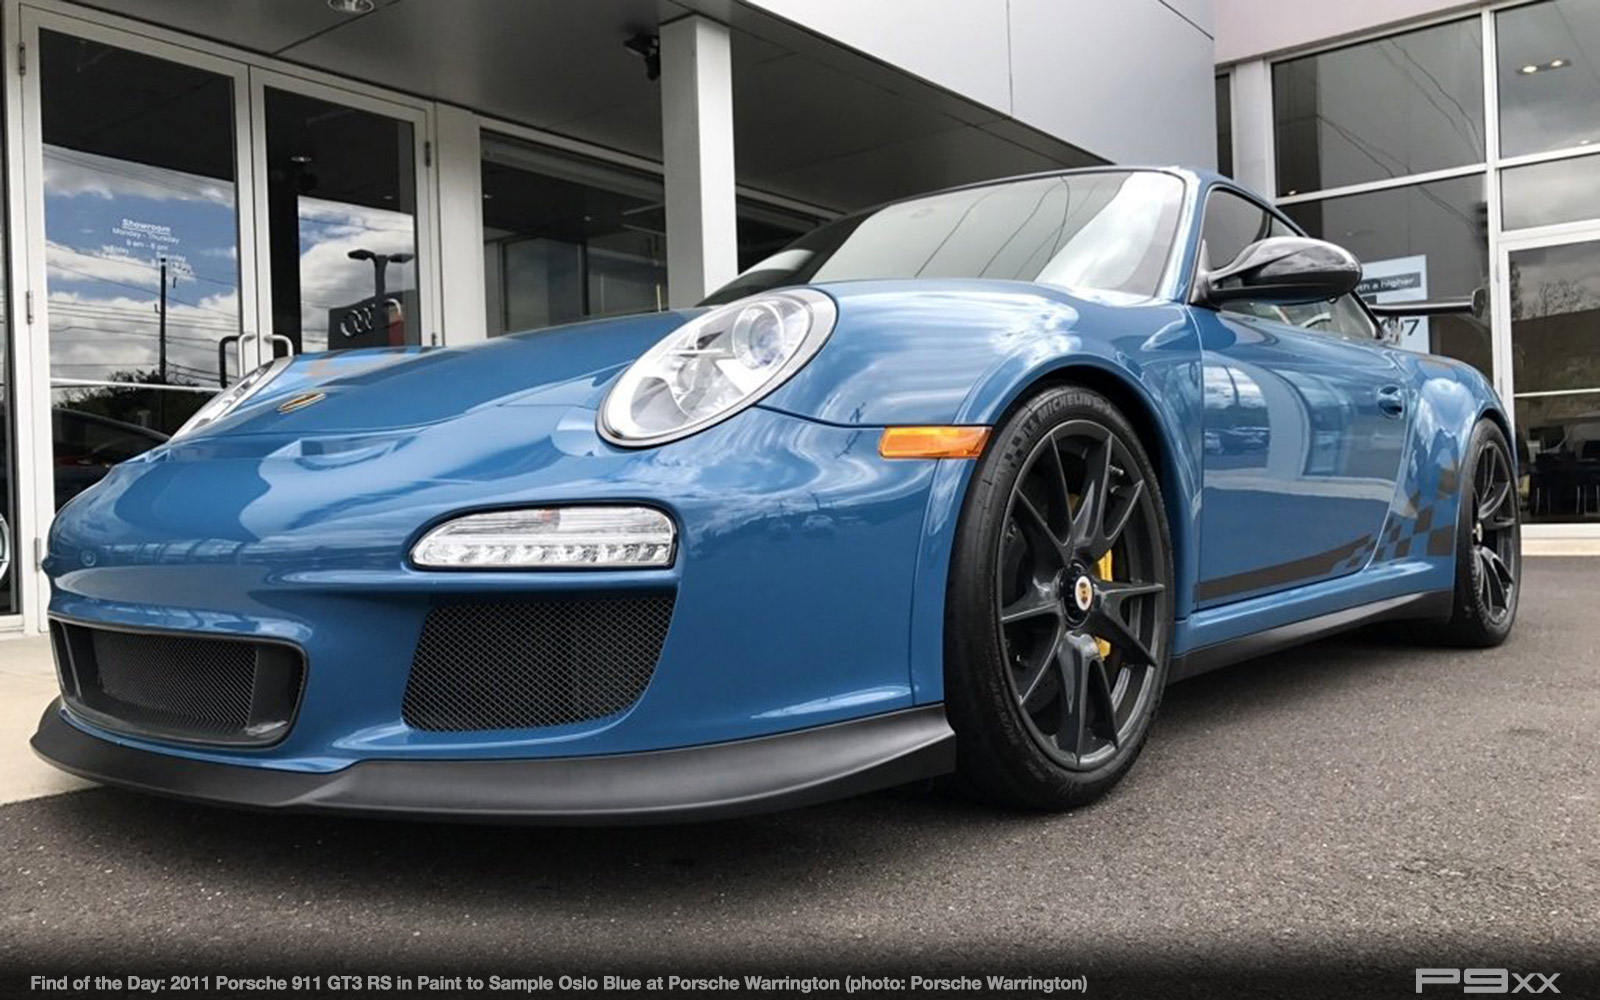 Porsche 959 For Sale >> In Market: Paint to Sample Oslo Blue 2011 Porsche 911 GT3 RS – P9XX